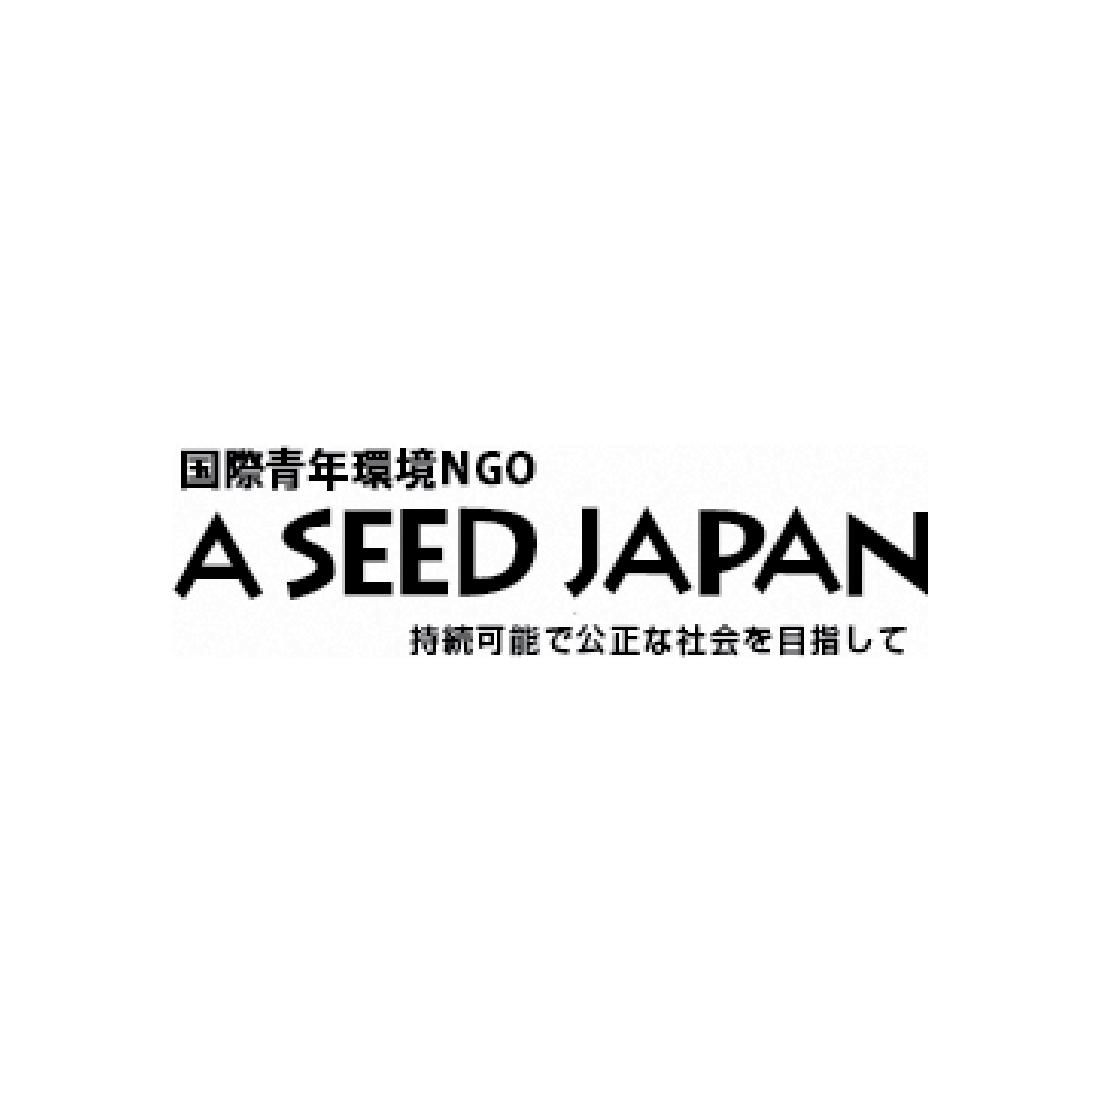 A SEED JAPAN logo